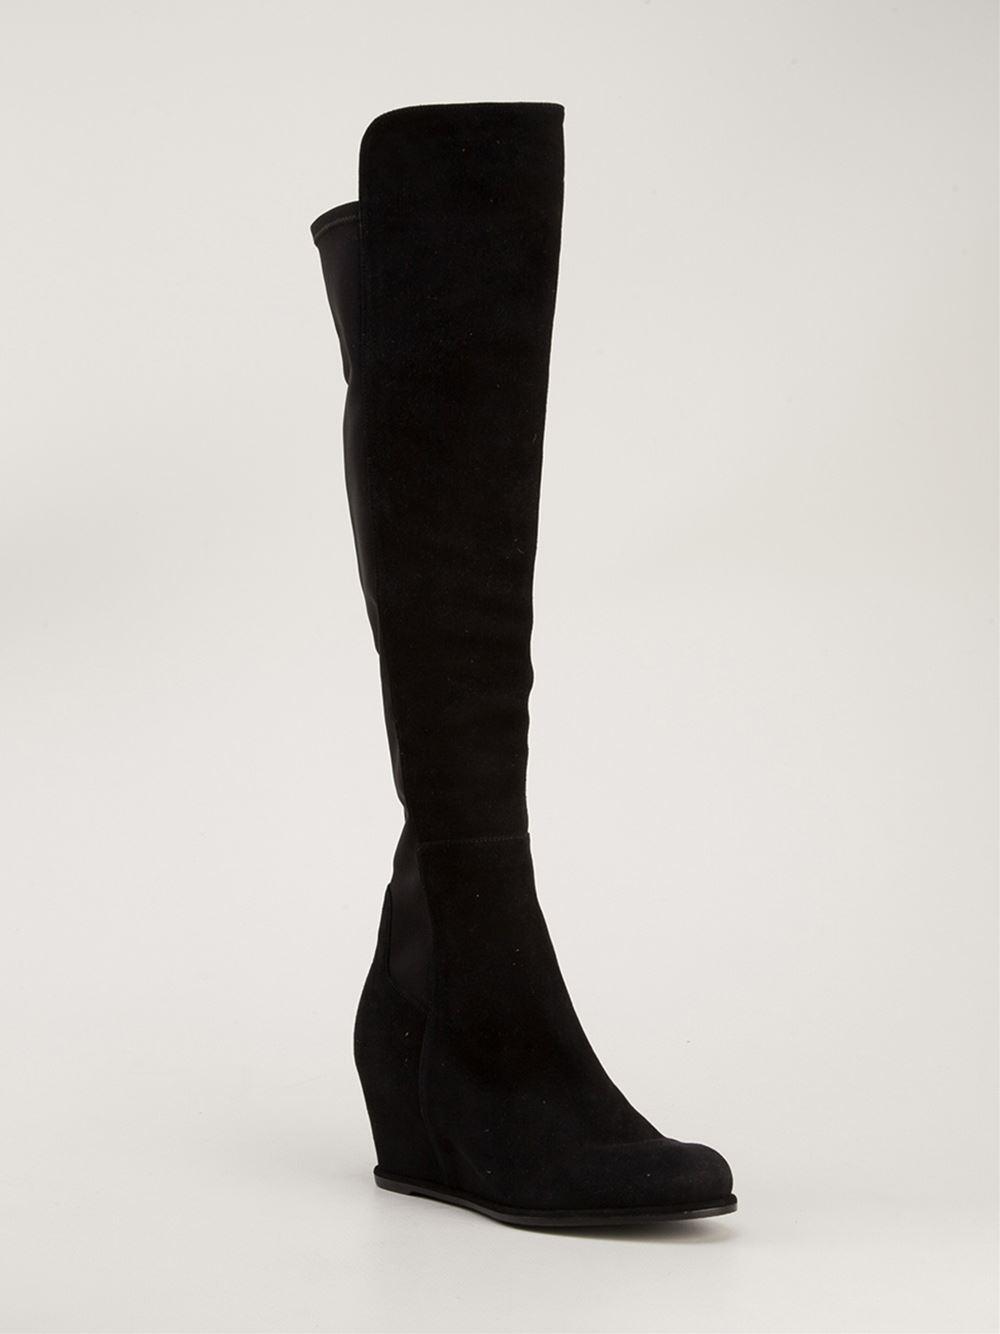 stuart weitzman 39 semi 39 boots in black lyst. Black Bedroom Furniture Sets. Home Design Ideas